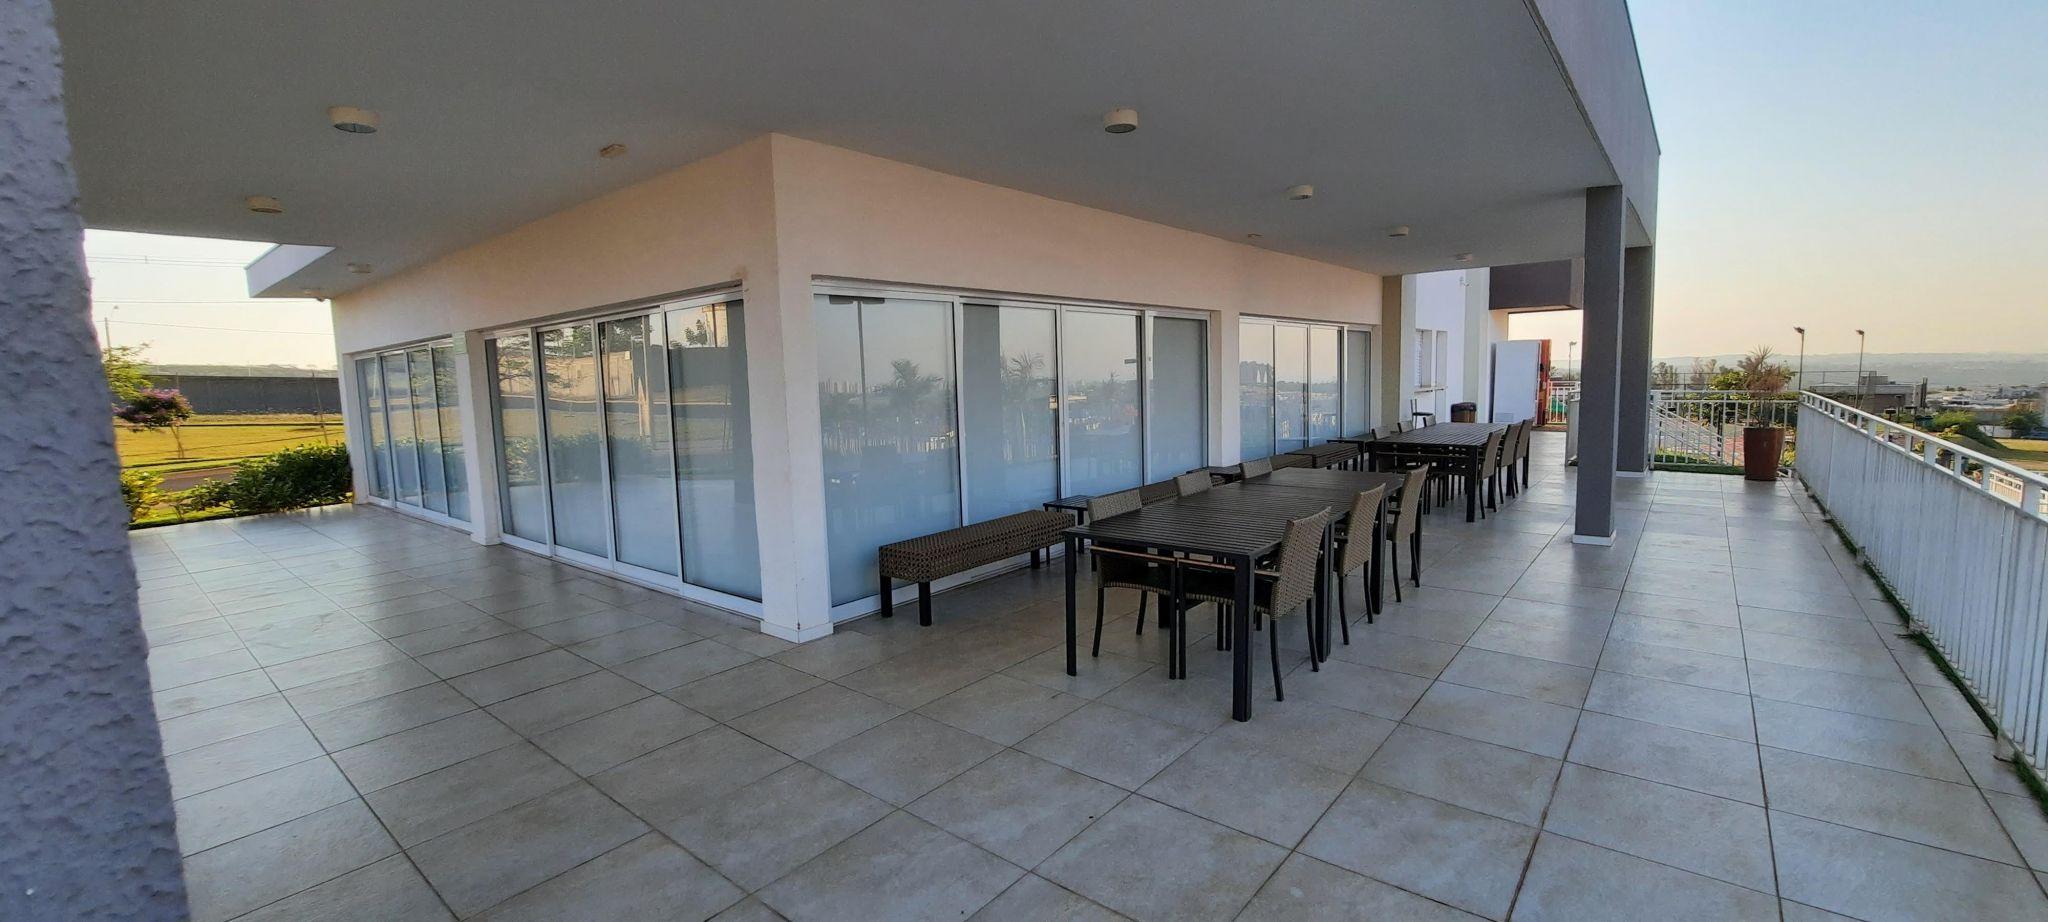 766 - Casa Quinta dos Ventos Térrea 3 suítes